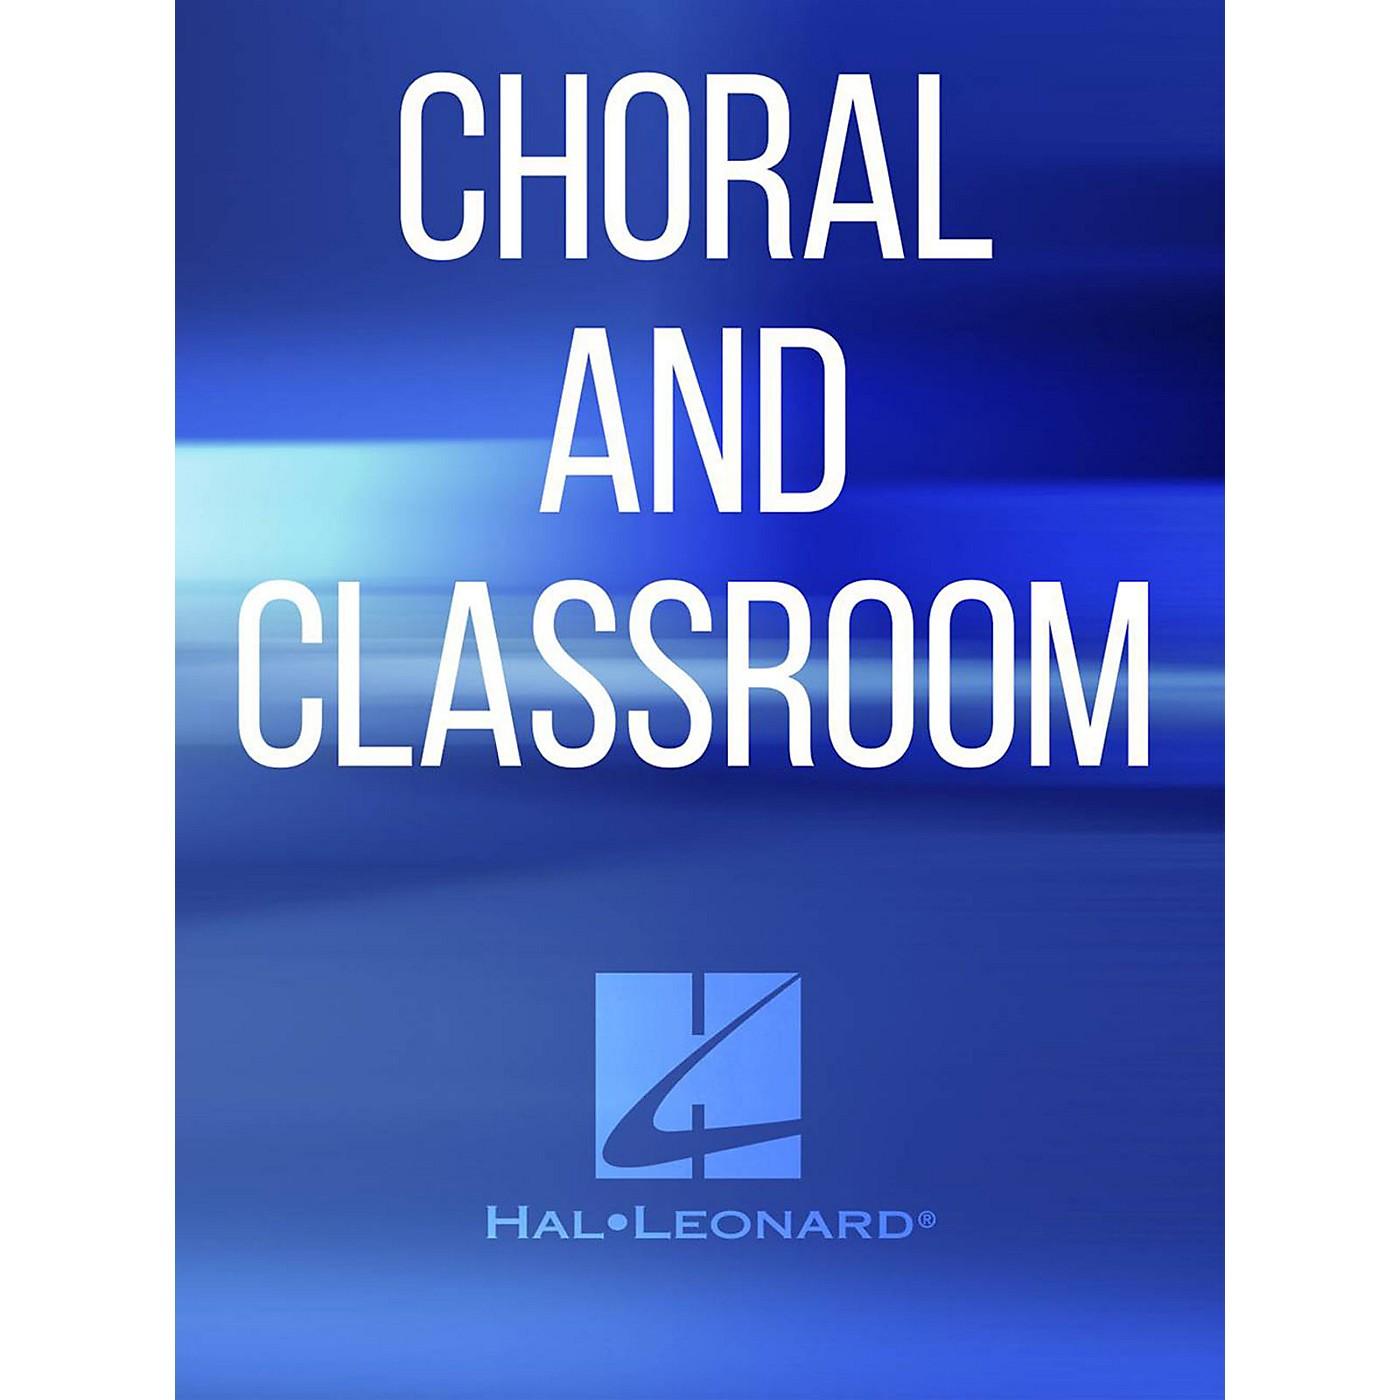 Hal Leonard That's Amoré (That's Love) ShowTrax CD by Dean Martin Arranged by Jill Gallina thumbnail